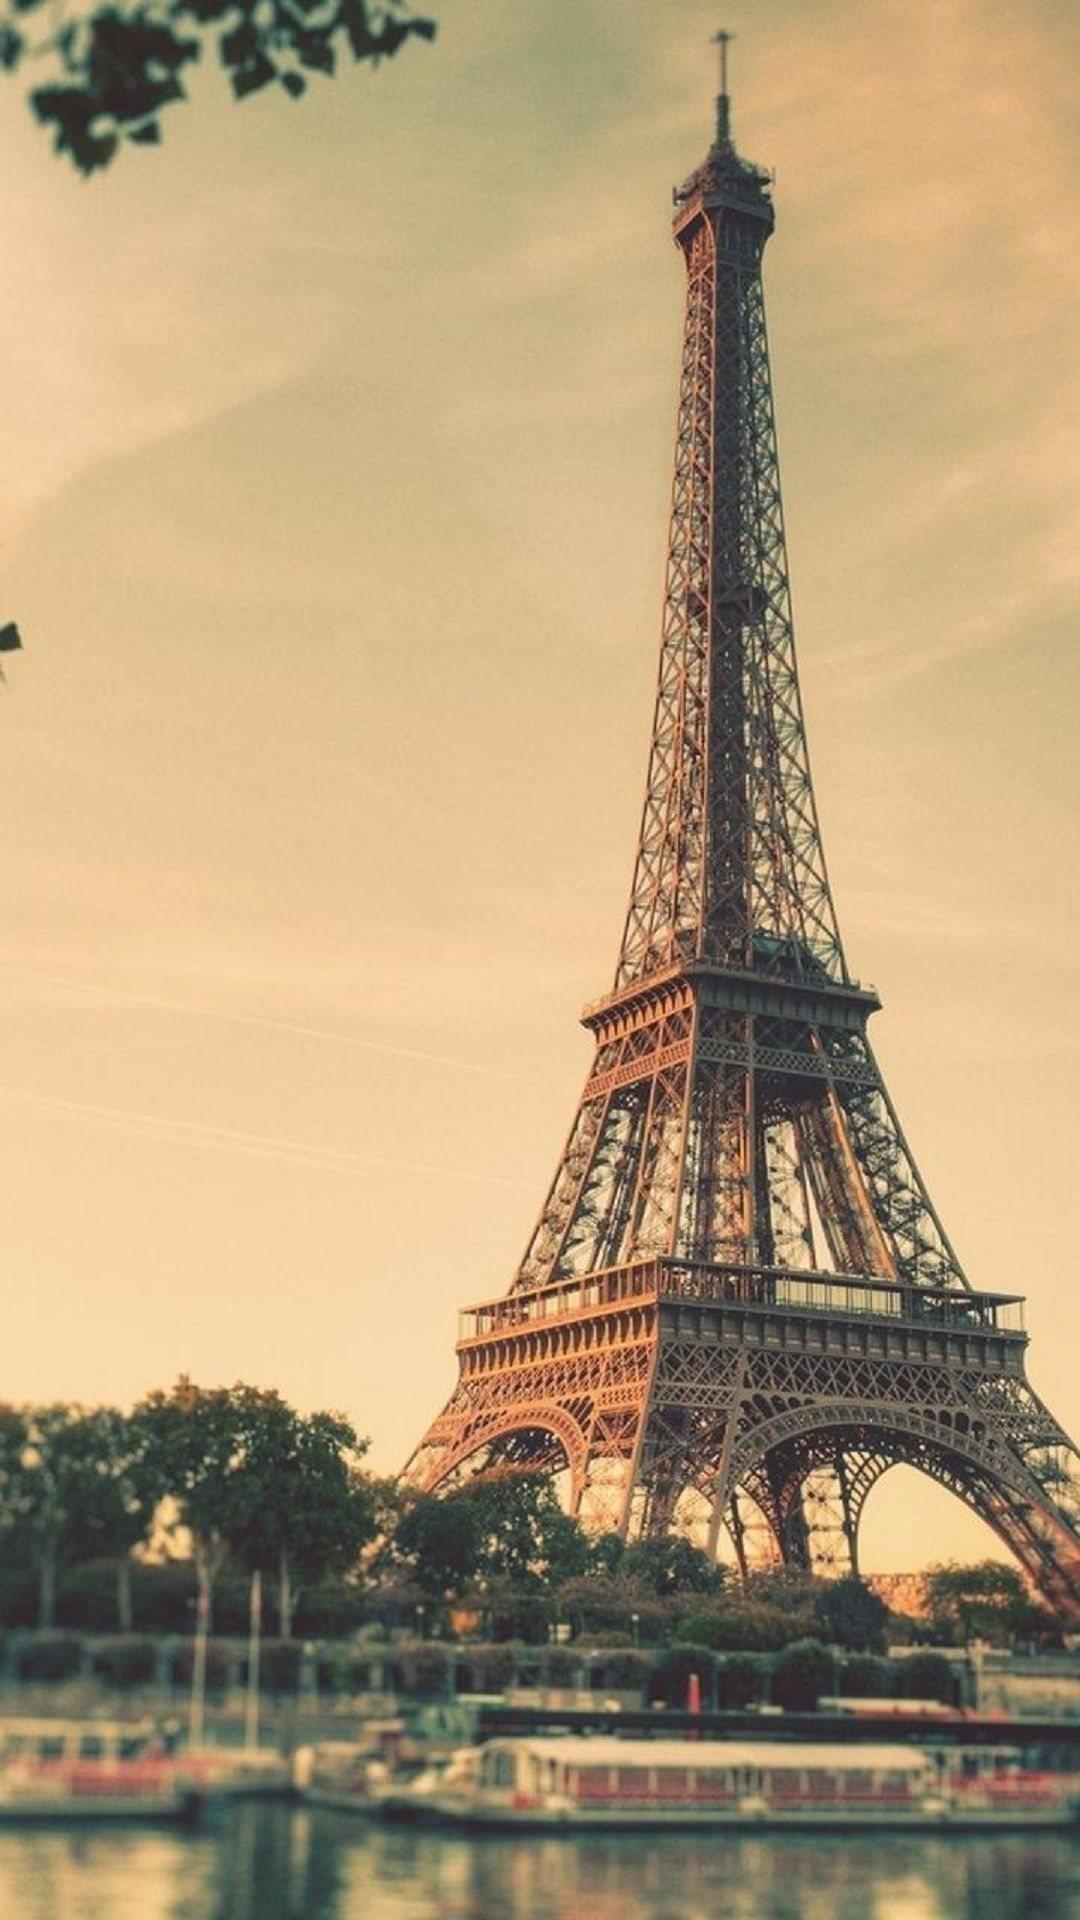 Wallpaper download paris - Download 0